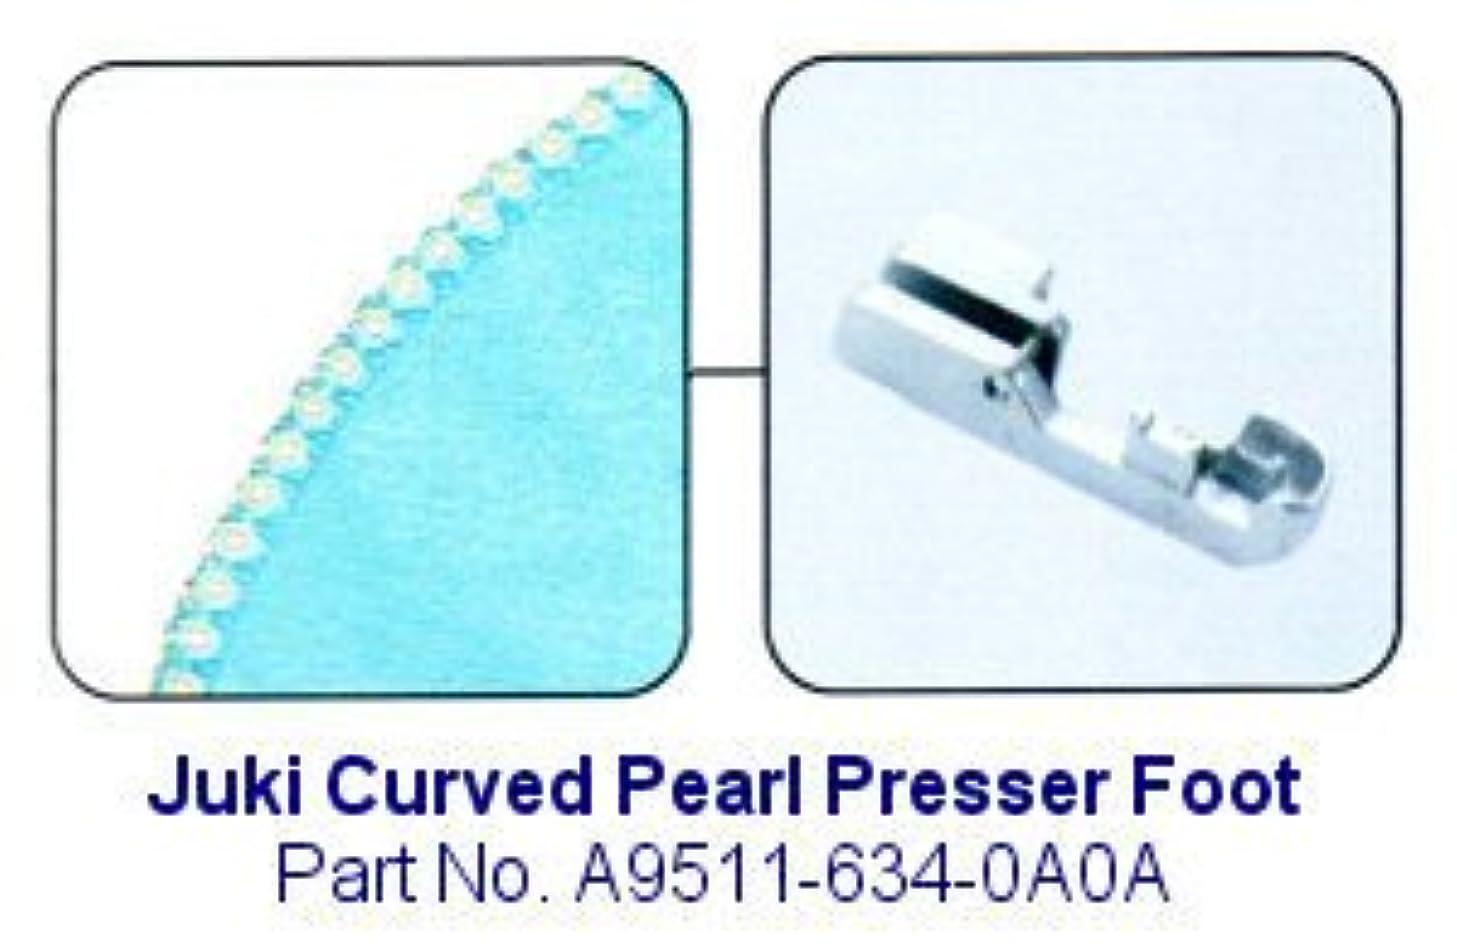 Juki Curved Pearl Serger Foot - A9511-634-0A0A